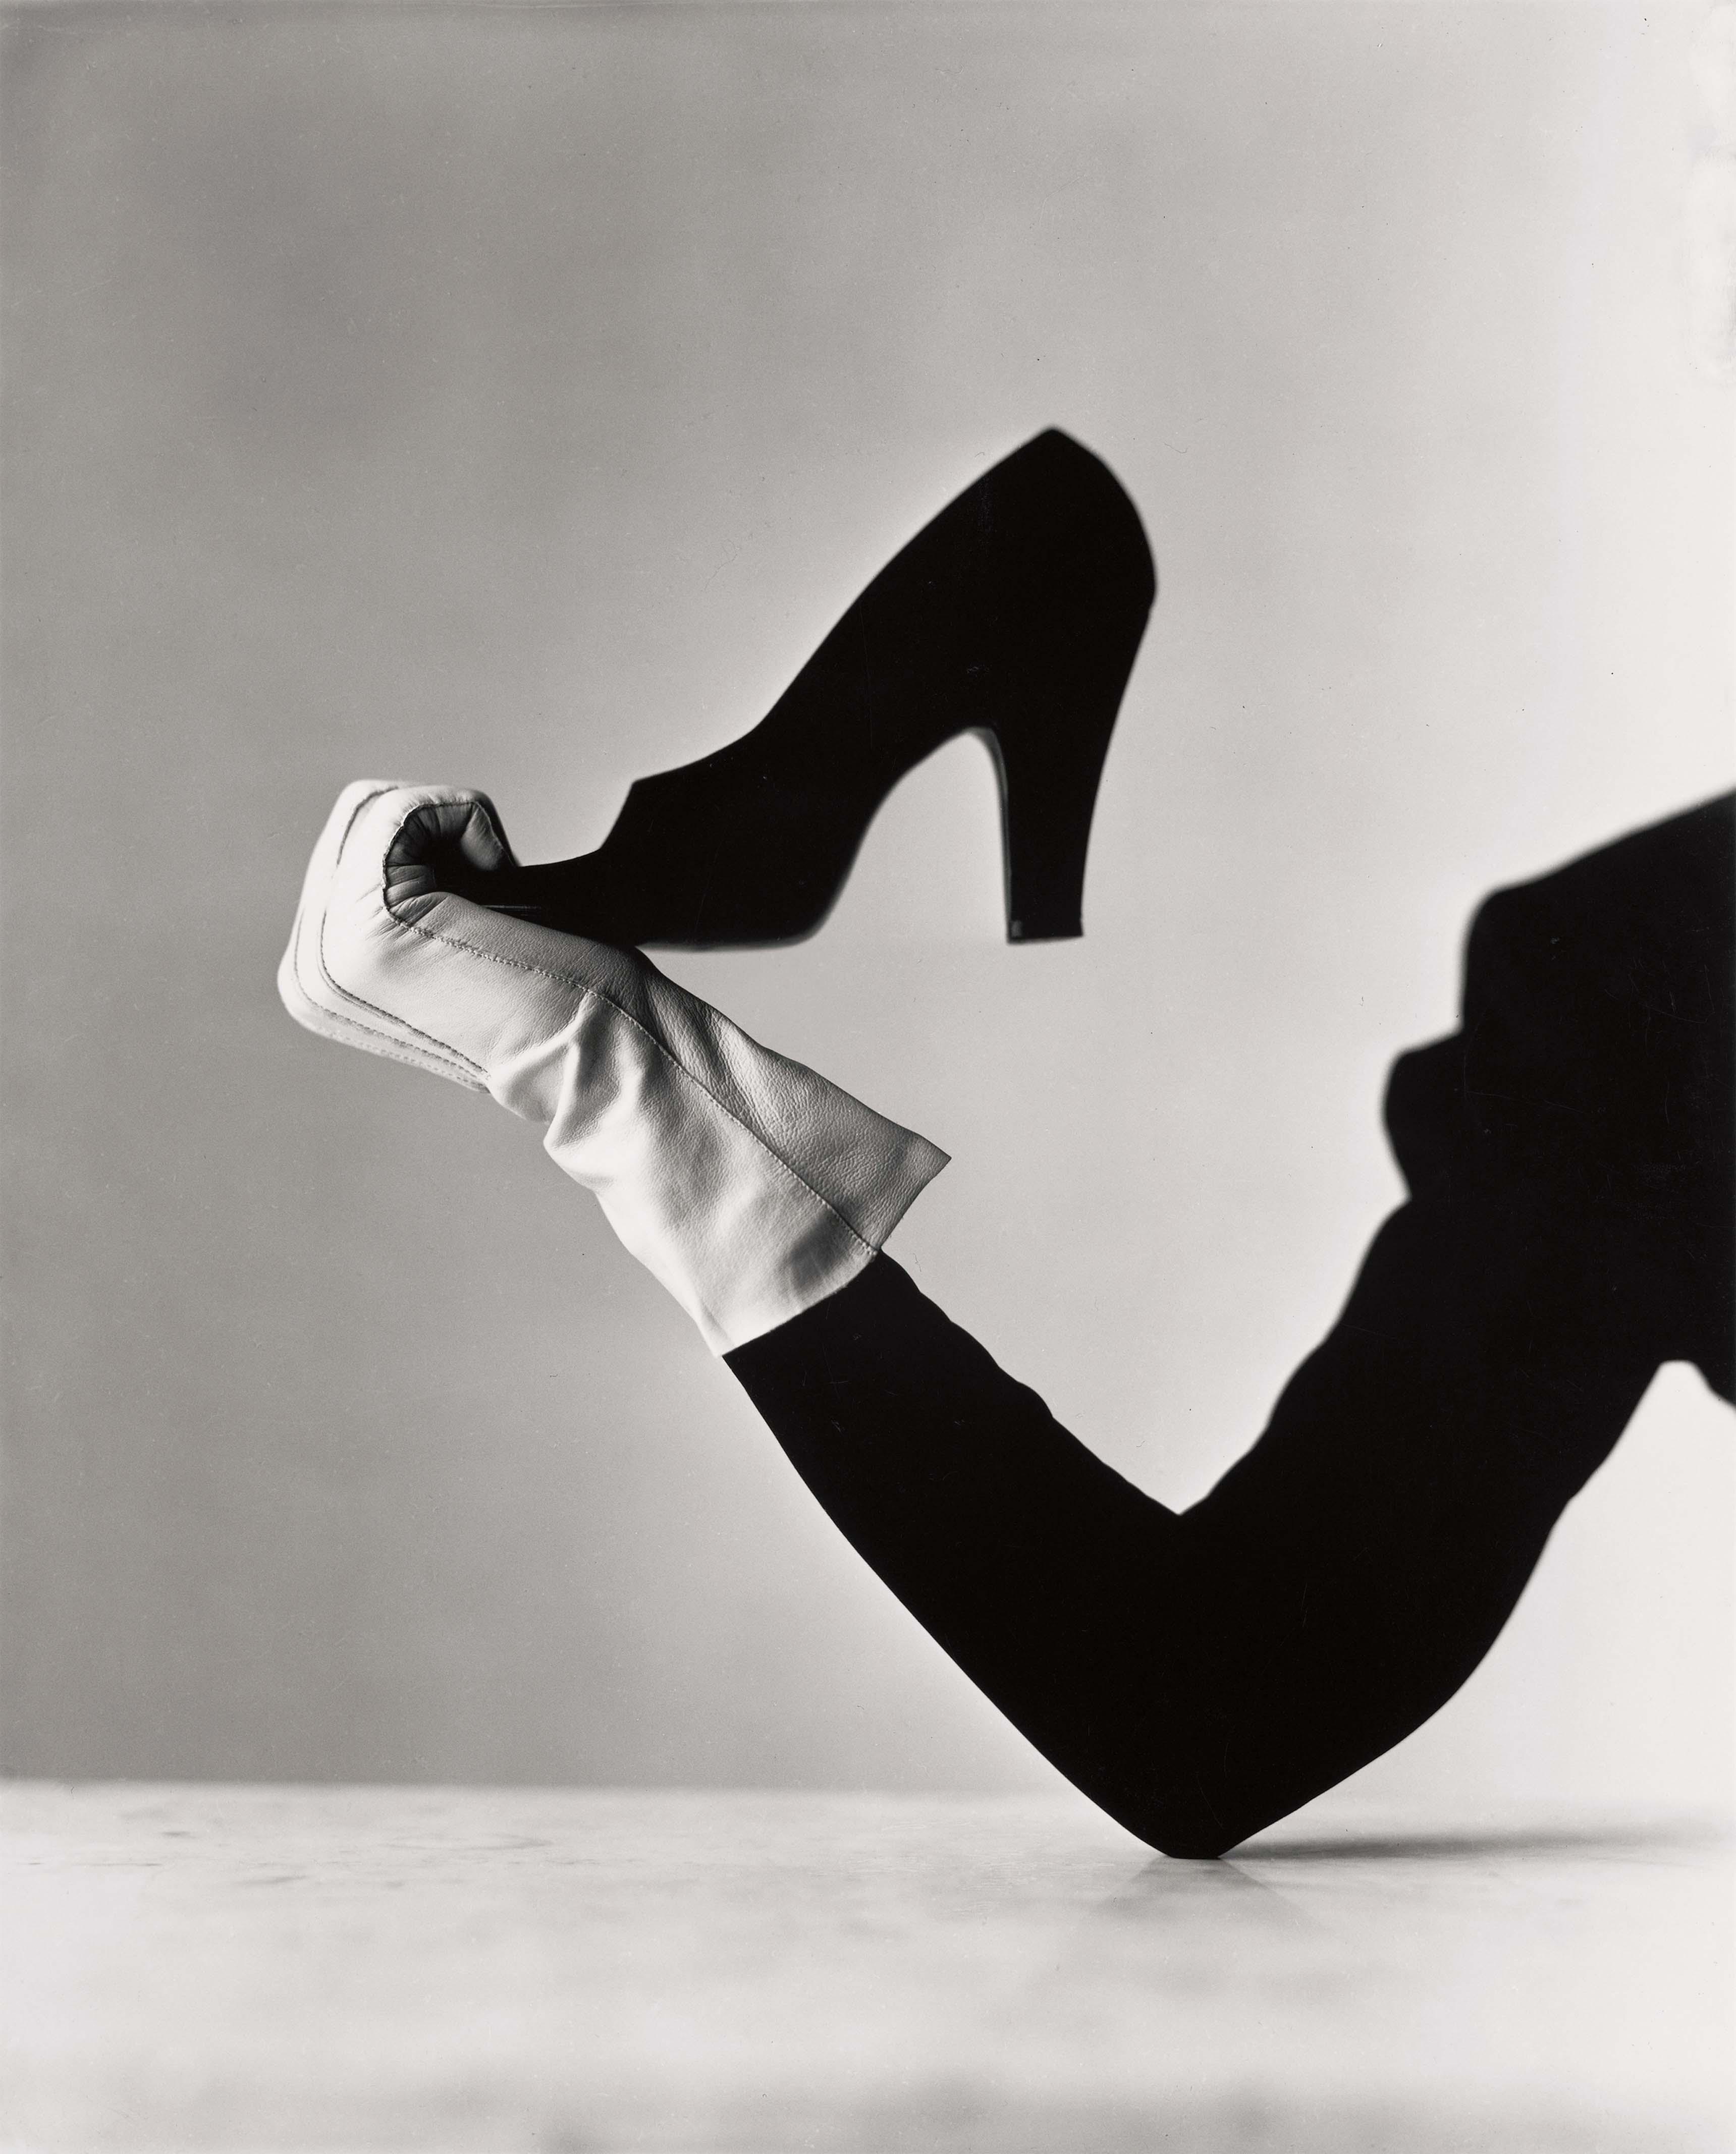 Glove and Shoe, New York, 1947. 24,4 x 19,7 cm.